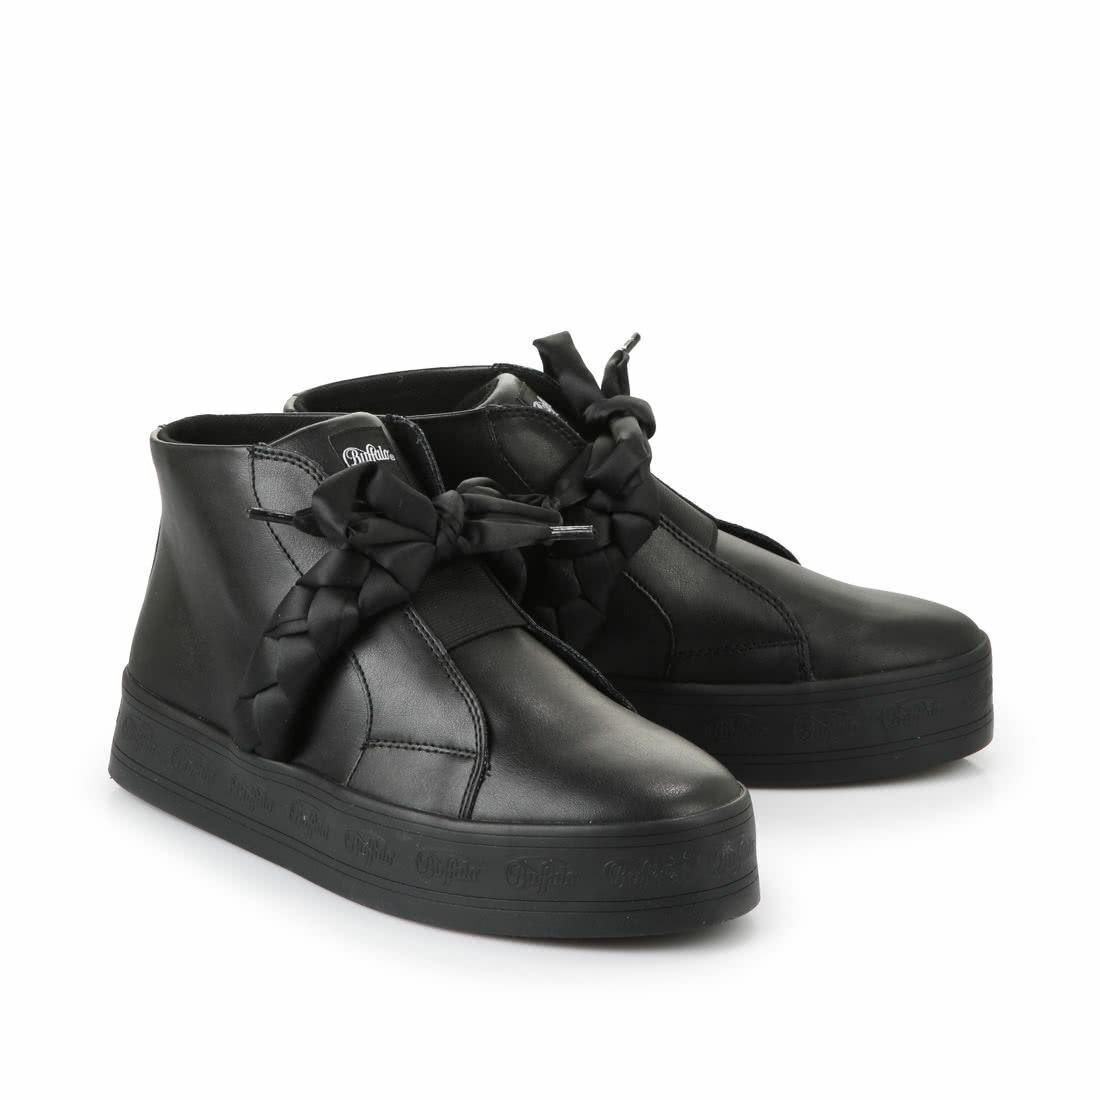 NEU Buffalo Plateau-Slip On High-Top Gr. 41 Sneaker schwarz Lederoptik NEU